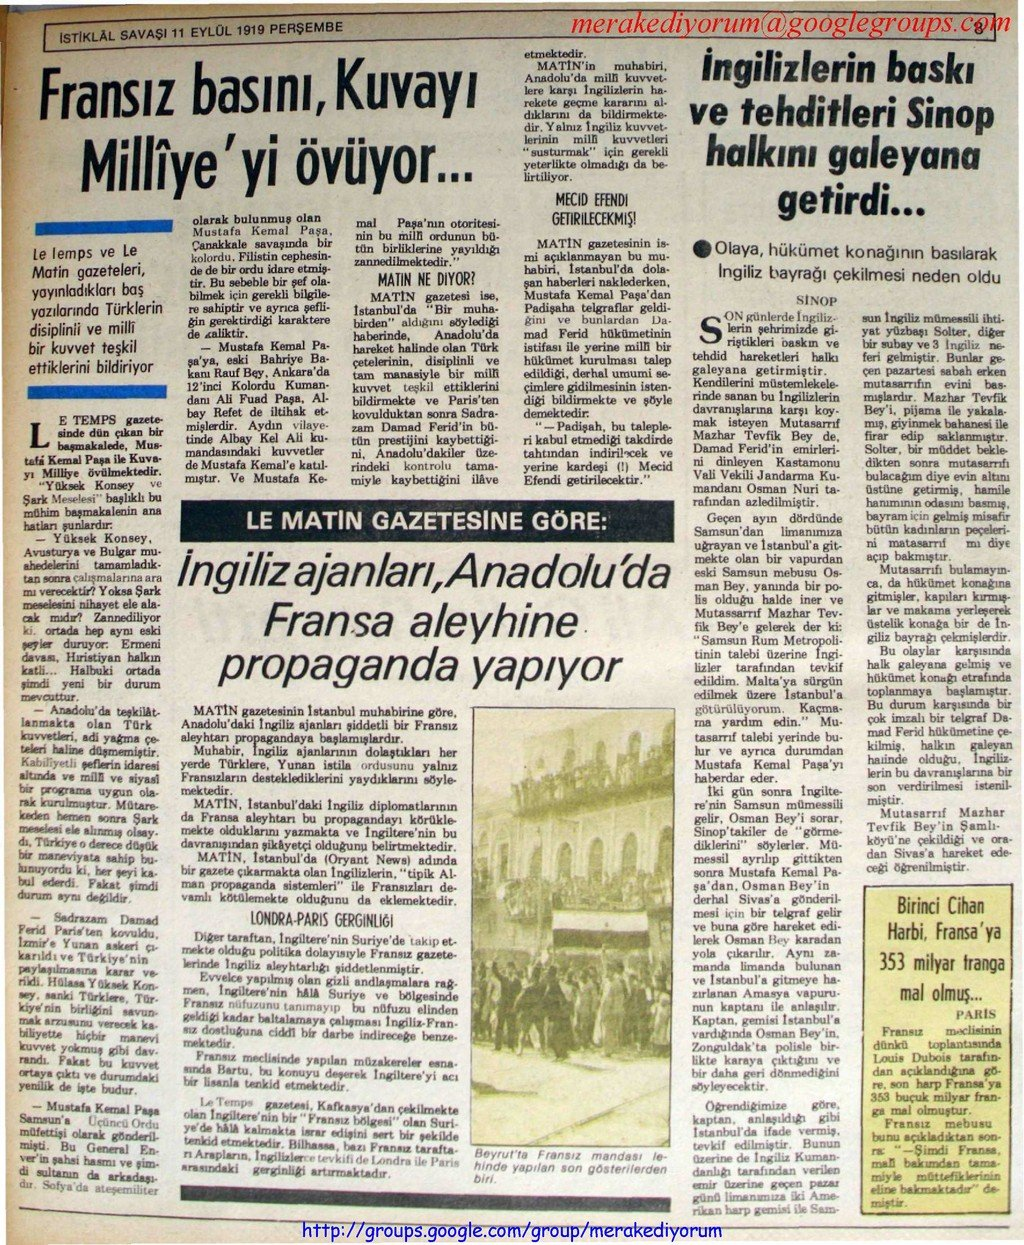 istiklal savaşı gazetesi - 11 eylül 1919